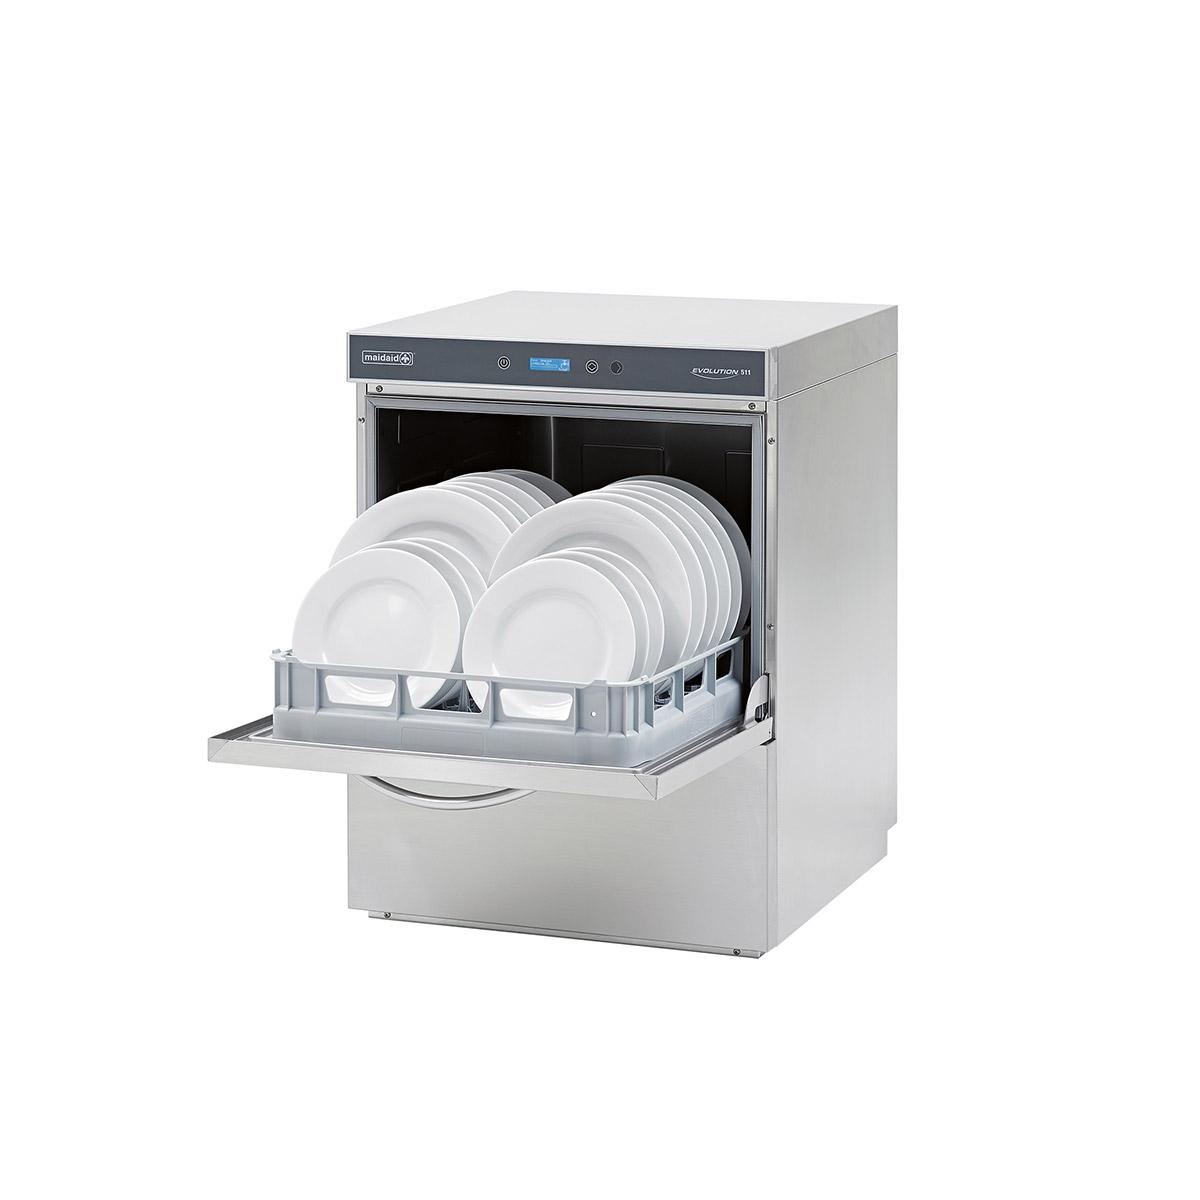 Maidaid Halcyon Evolution Dishwasher EVO511